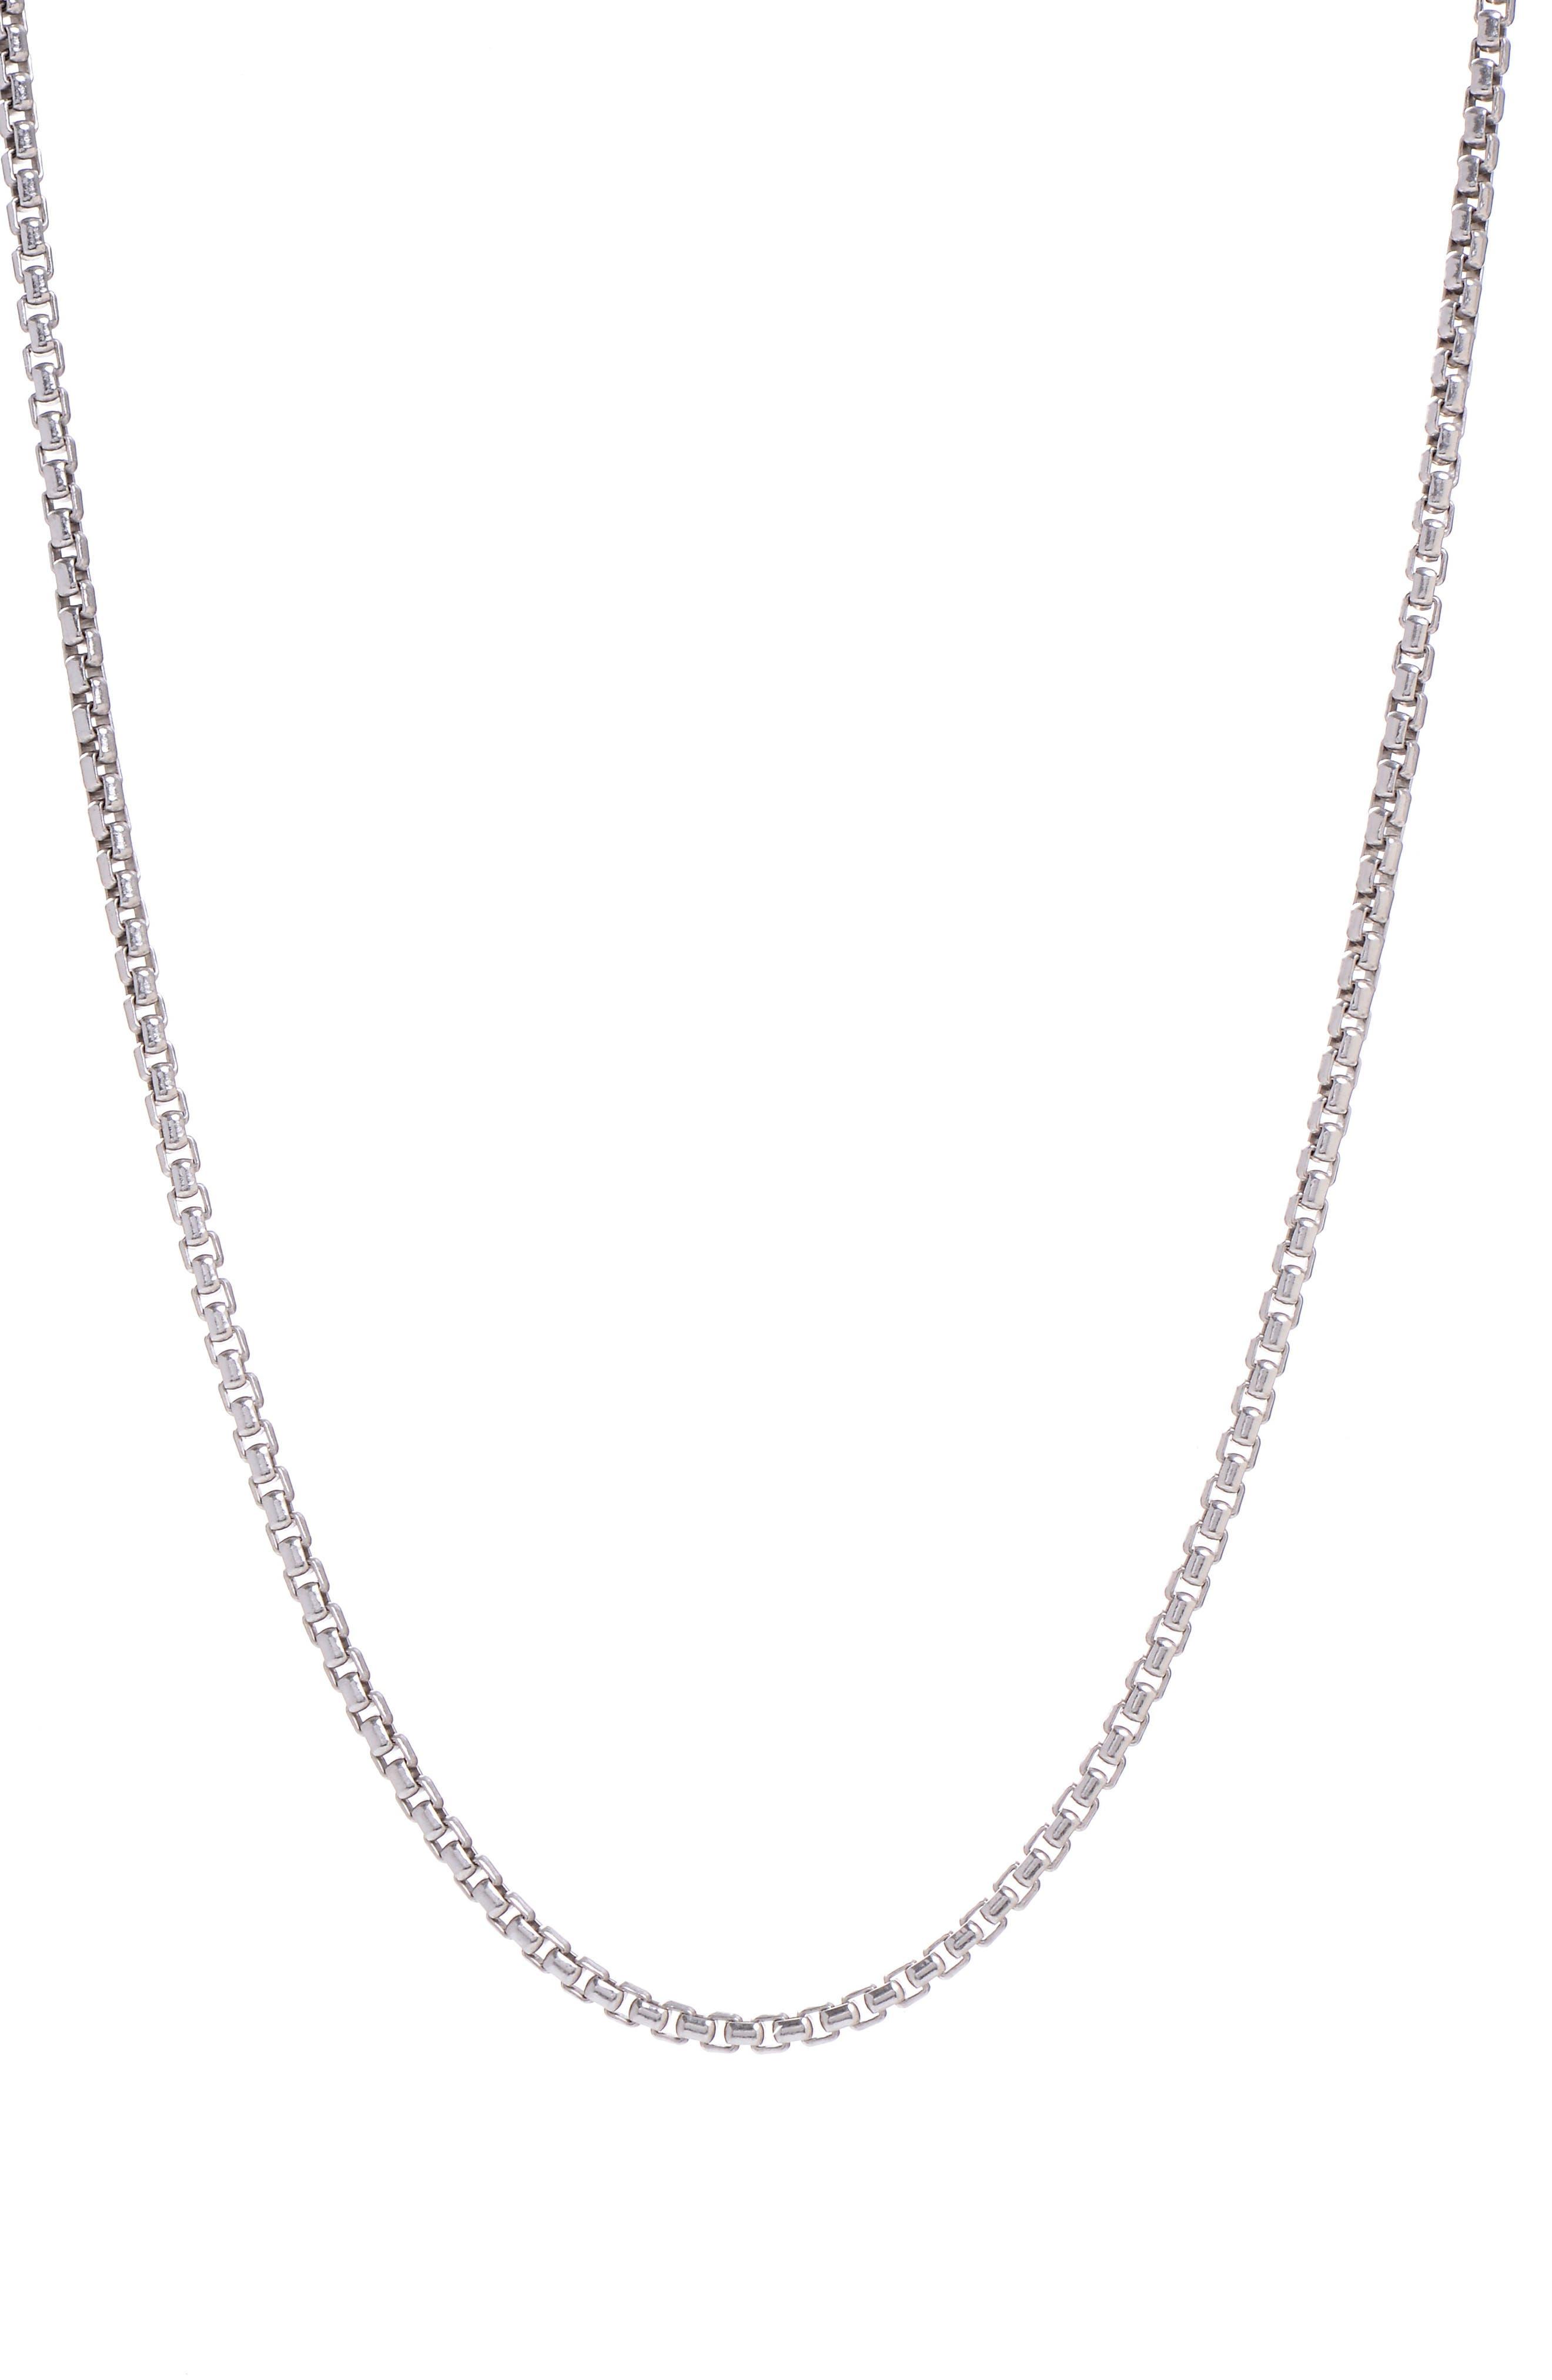 Degs & Sal Box Chain Necklace